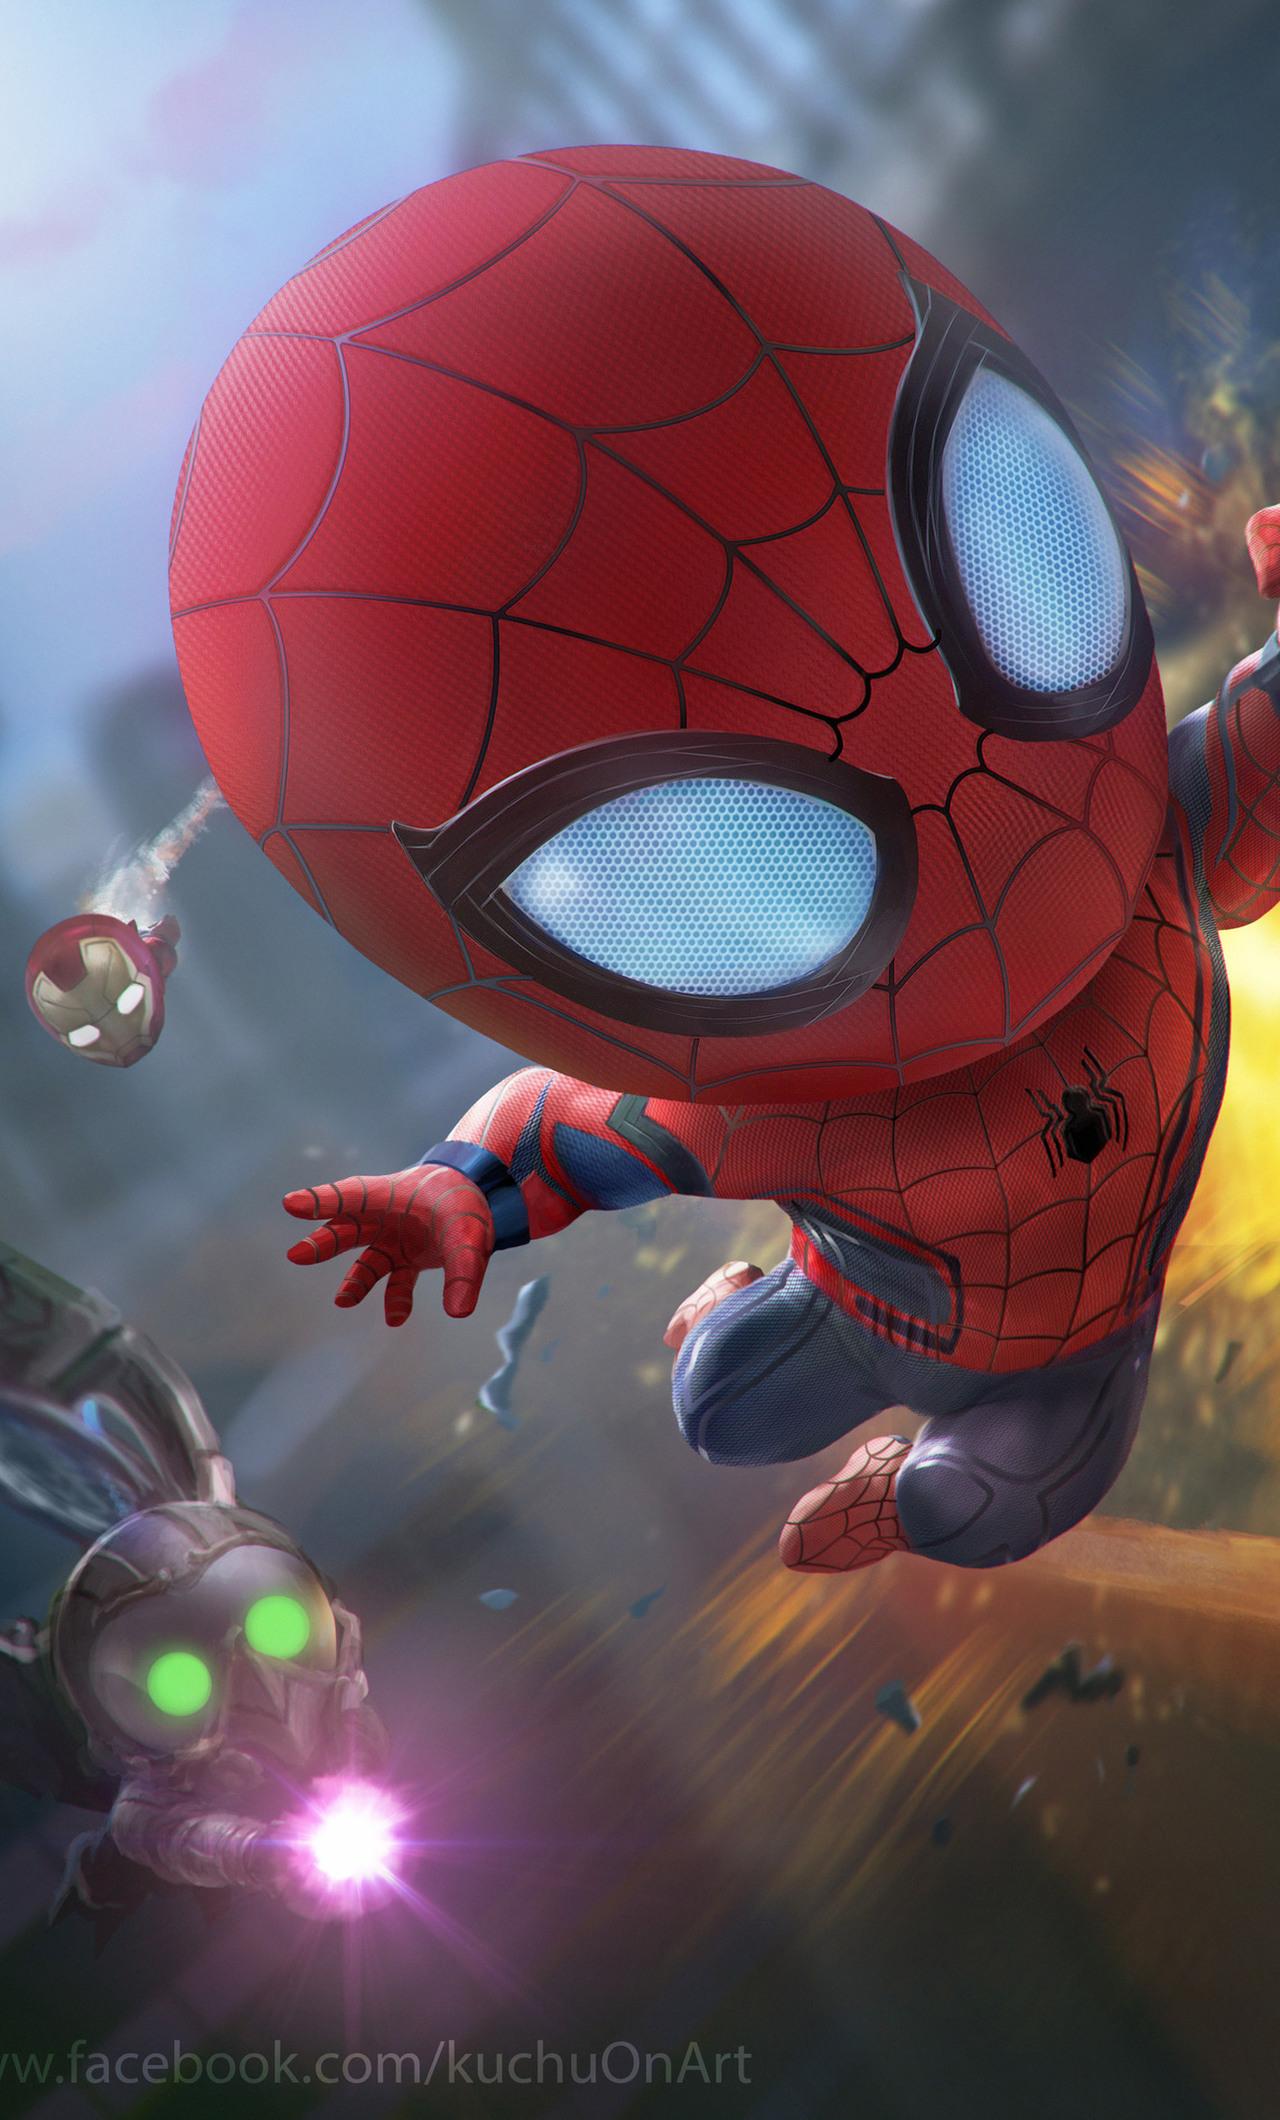 spiderman-and-iron-man-artwork-hd-p5.jpg